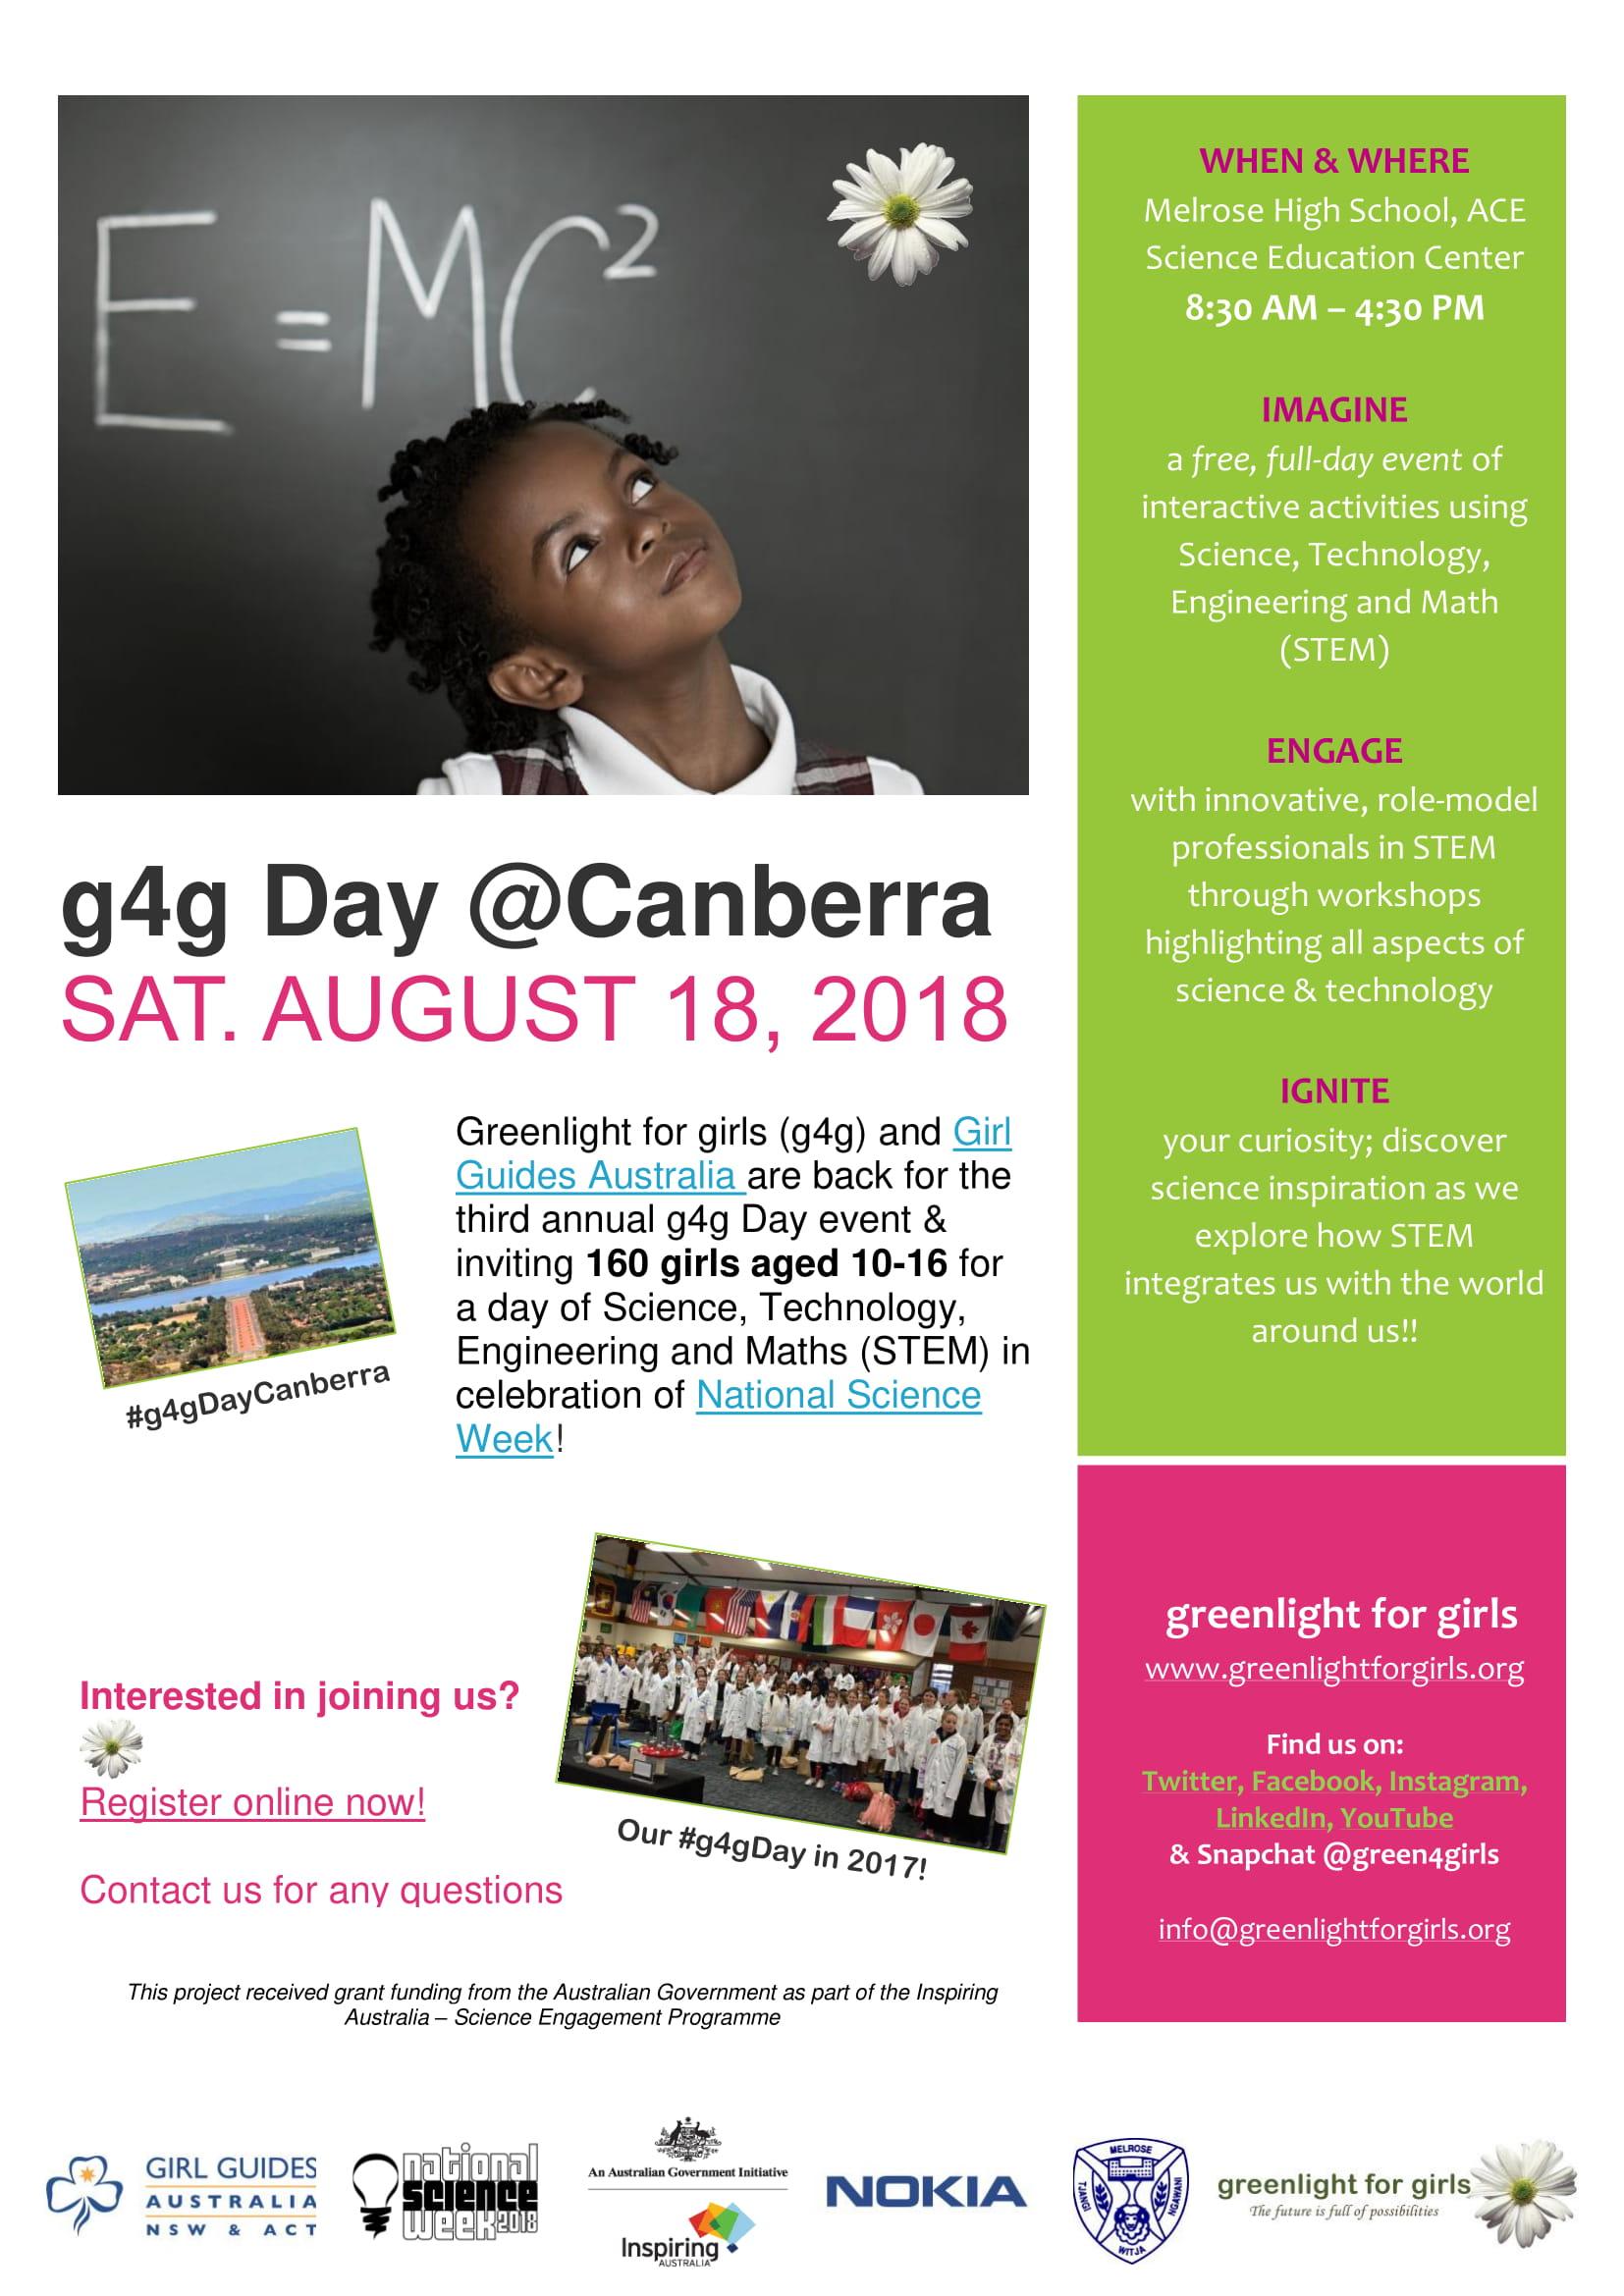 g4g Day Canberra 2018 Info Flyer-1.jpg